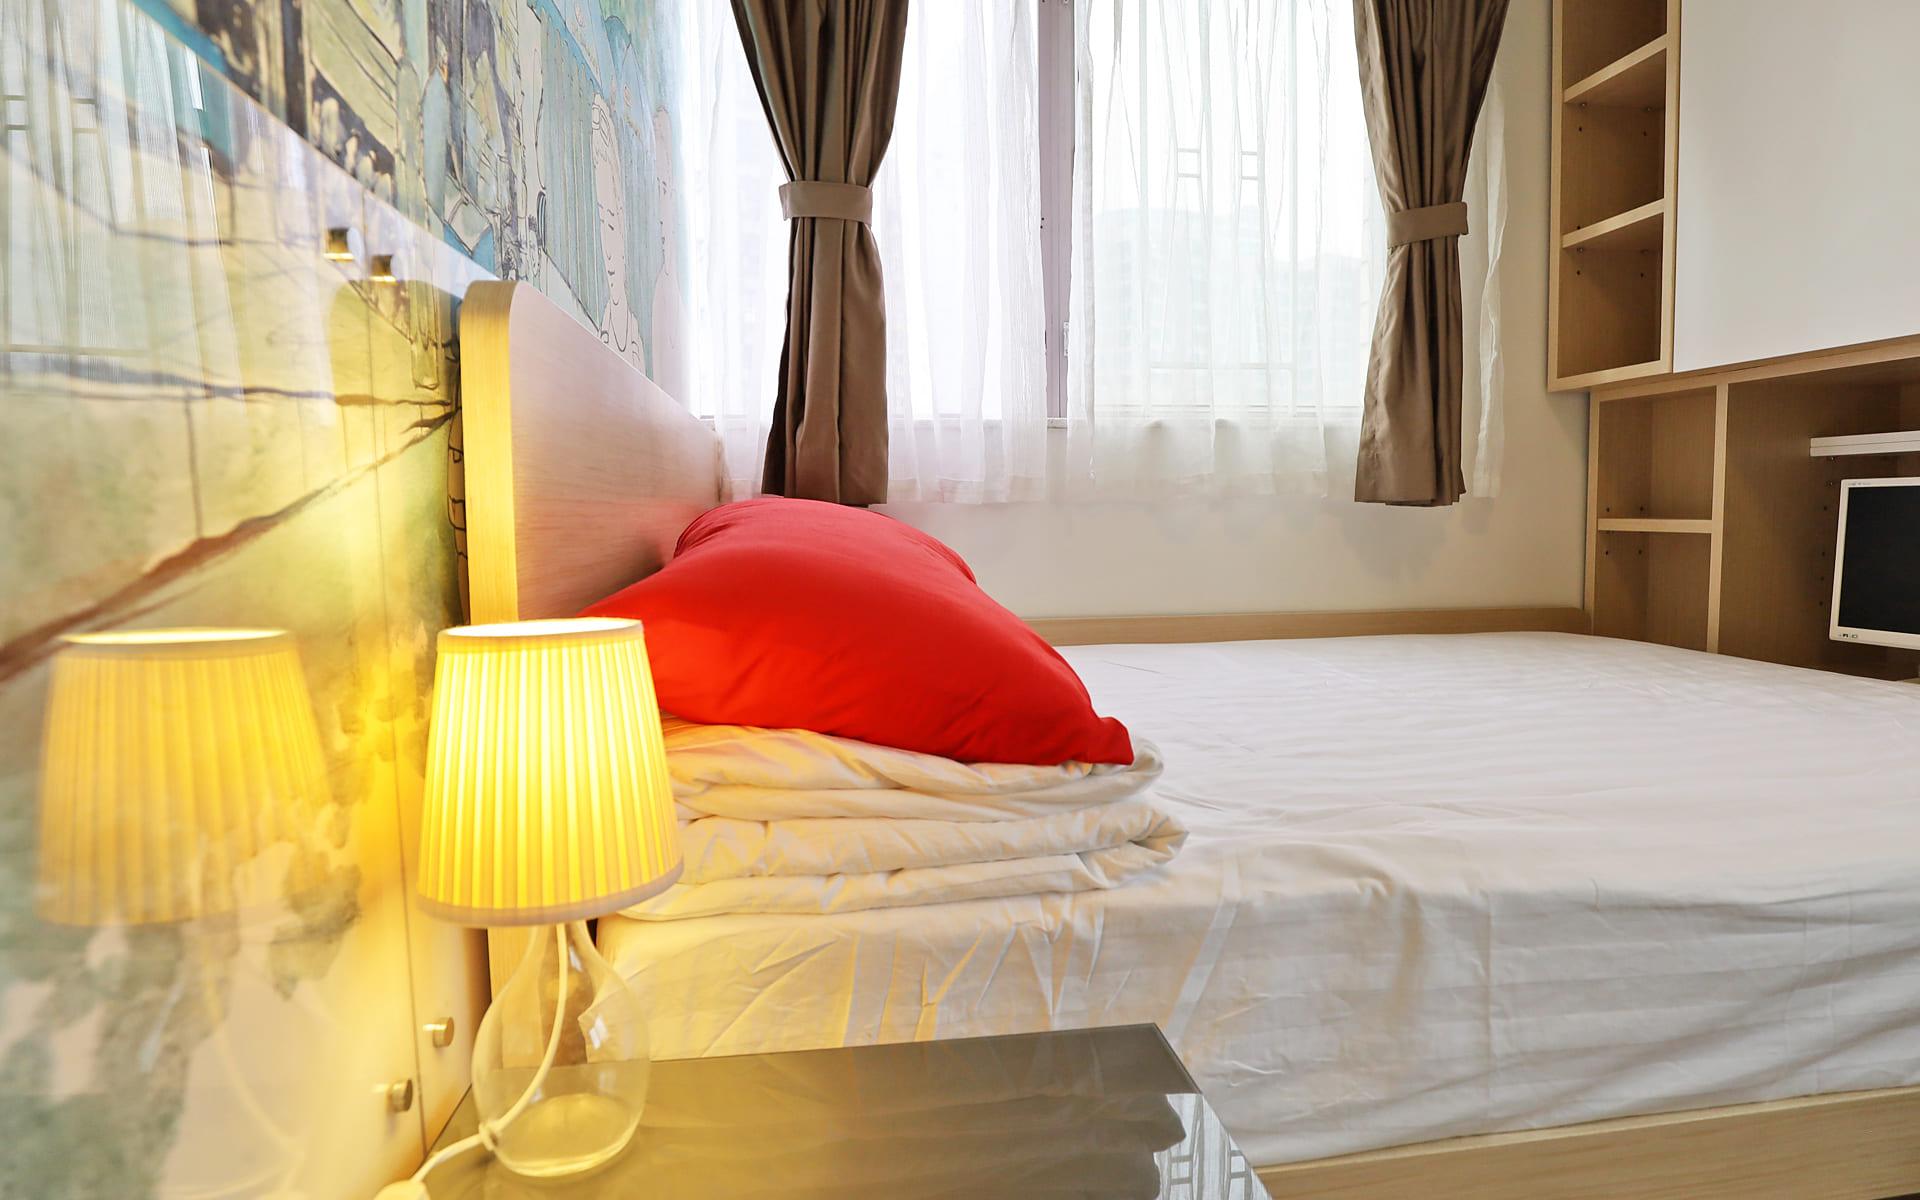 hk_service_apartment_2030922111589362127.jpg